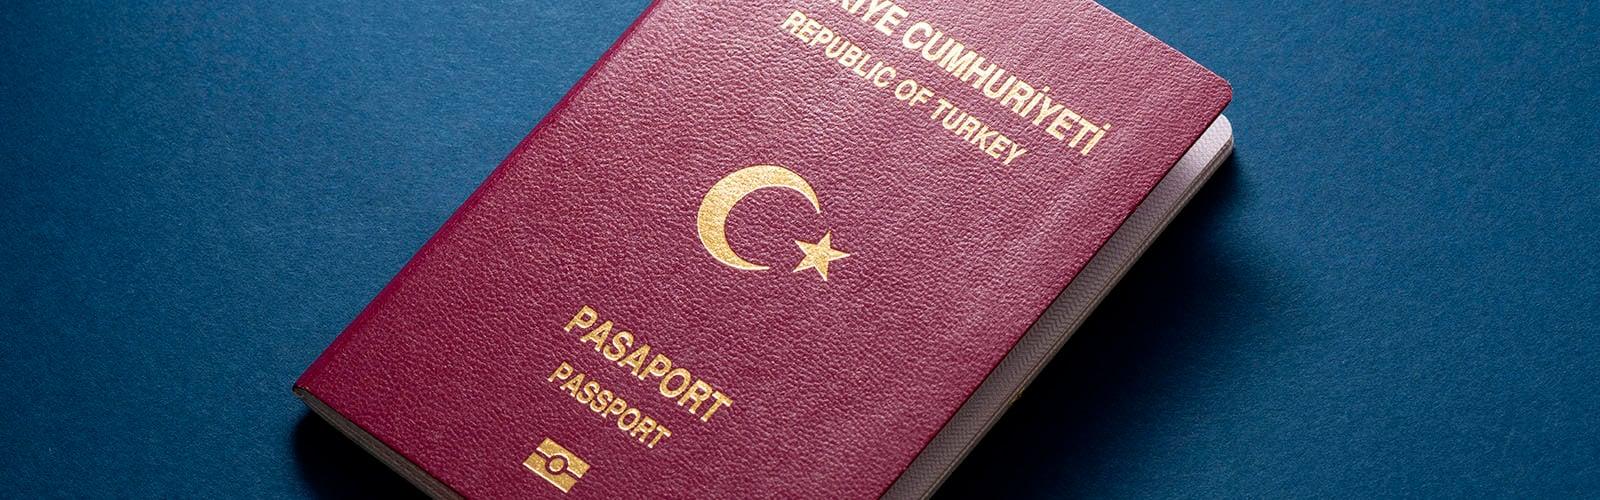 Passport from Turkey - Savory & Partners - Dubai, UAE-1